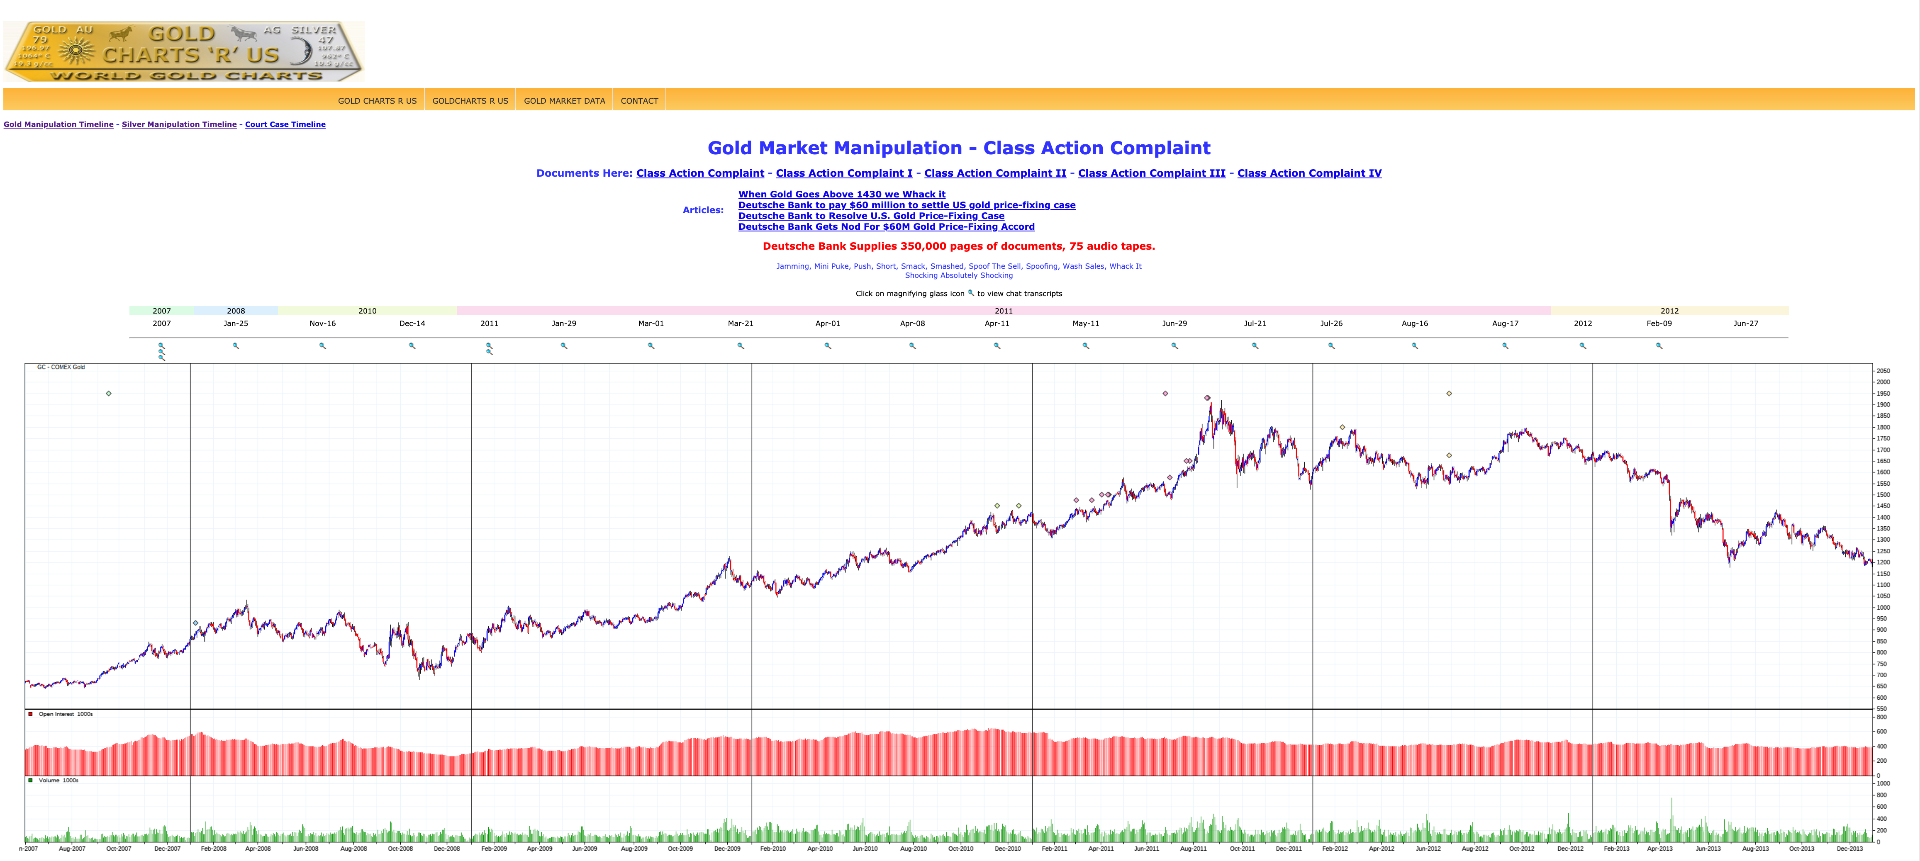 Gold Price Manipulation transcripts GoldChartRUs.com SD Bullion